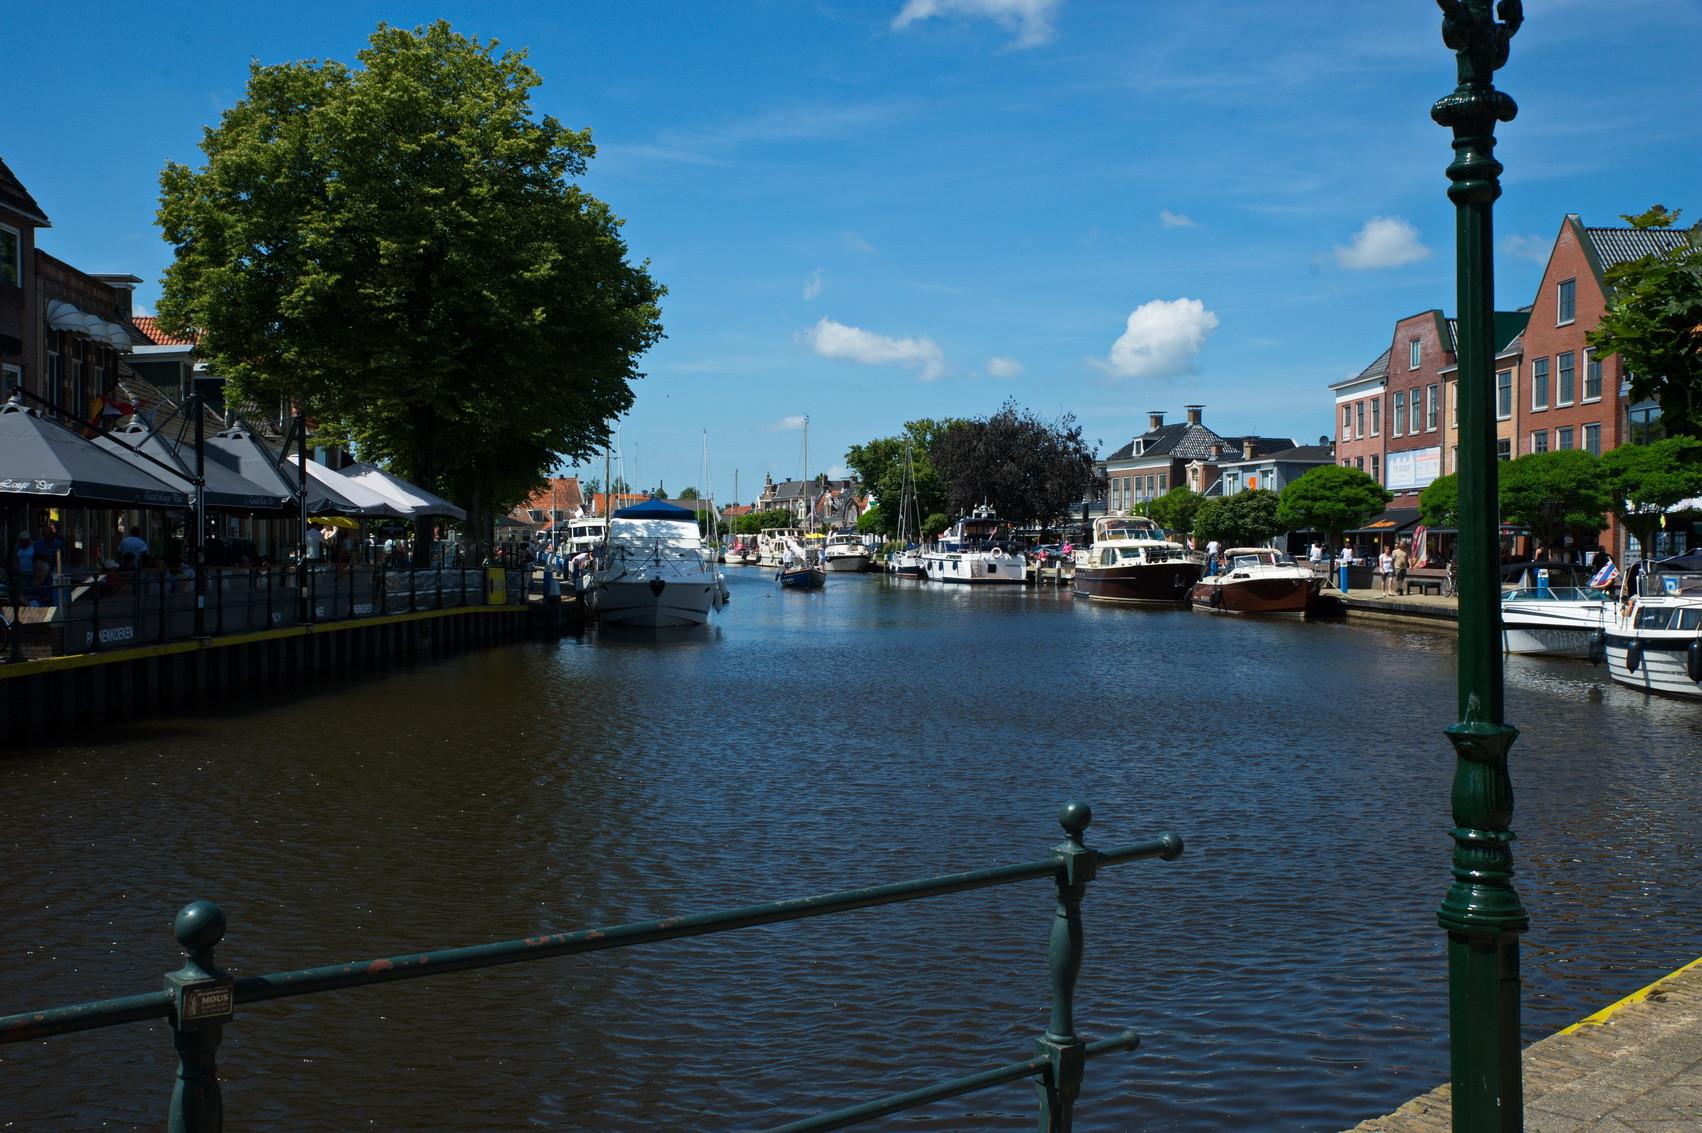 Lemmer, Ijsselmeer, Holland, Wasser, Segeln, Urlaub, Mies Vandenbergh Fotografie